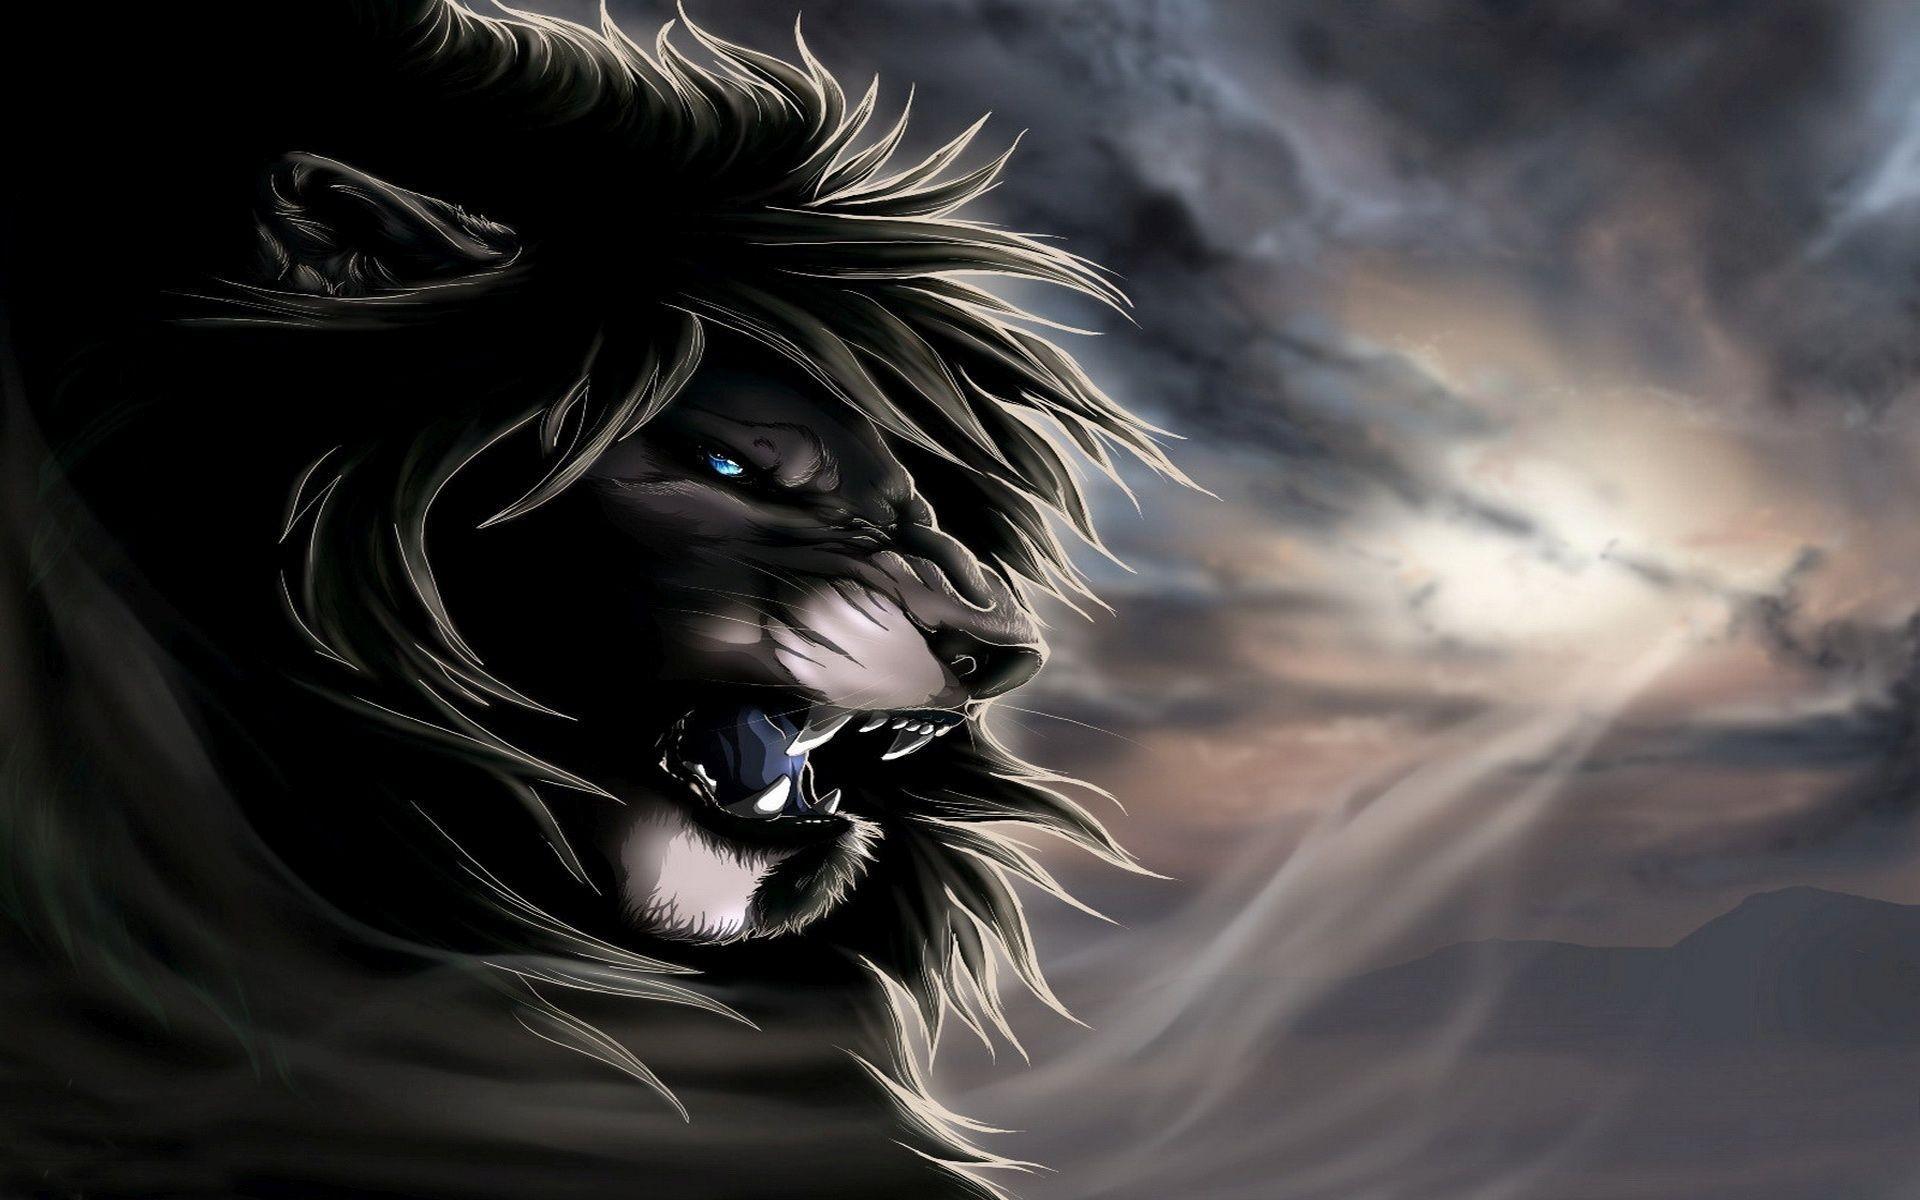 angry-lion-wallpaper.jpg